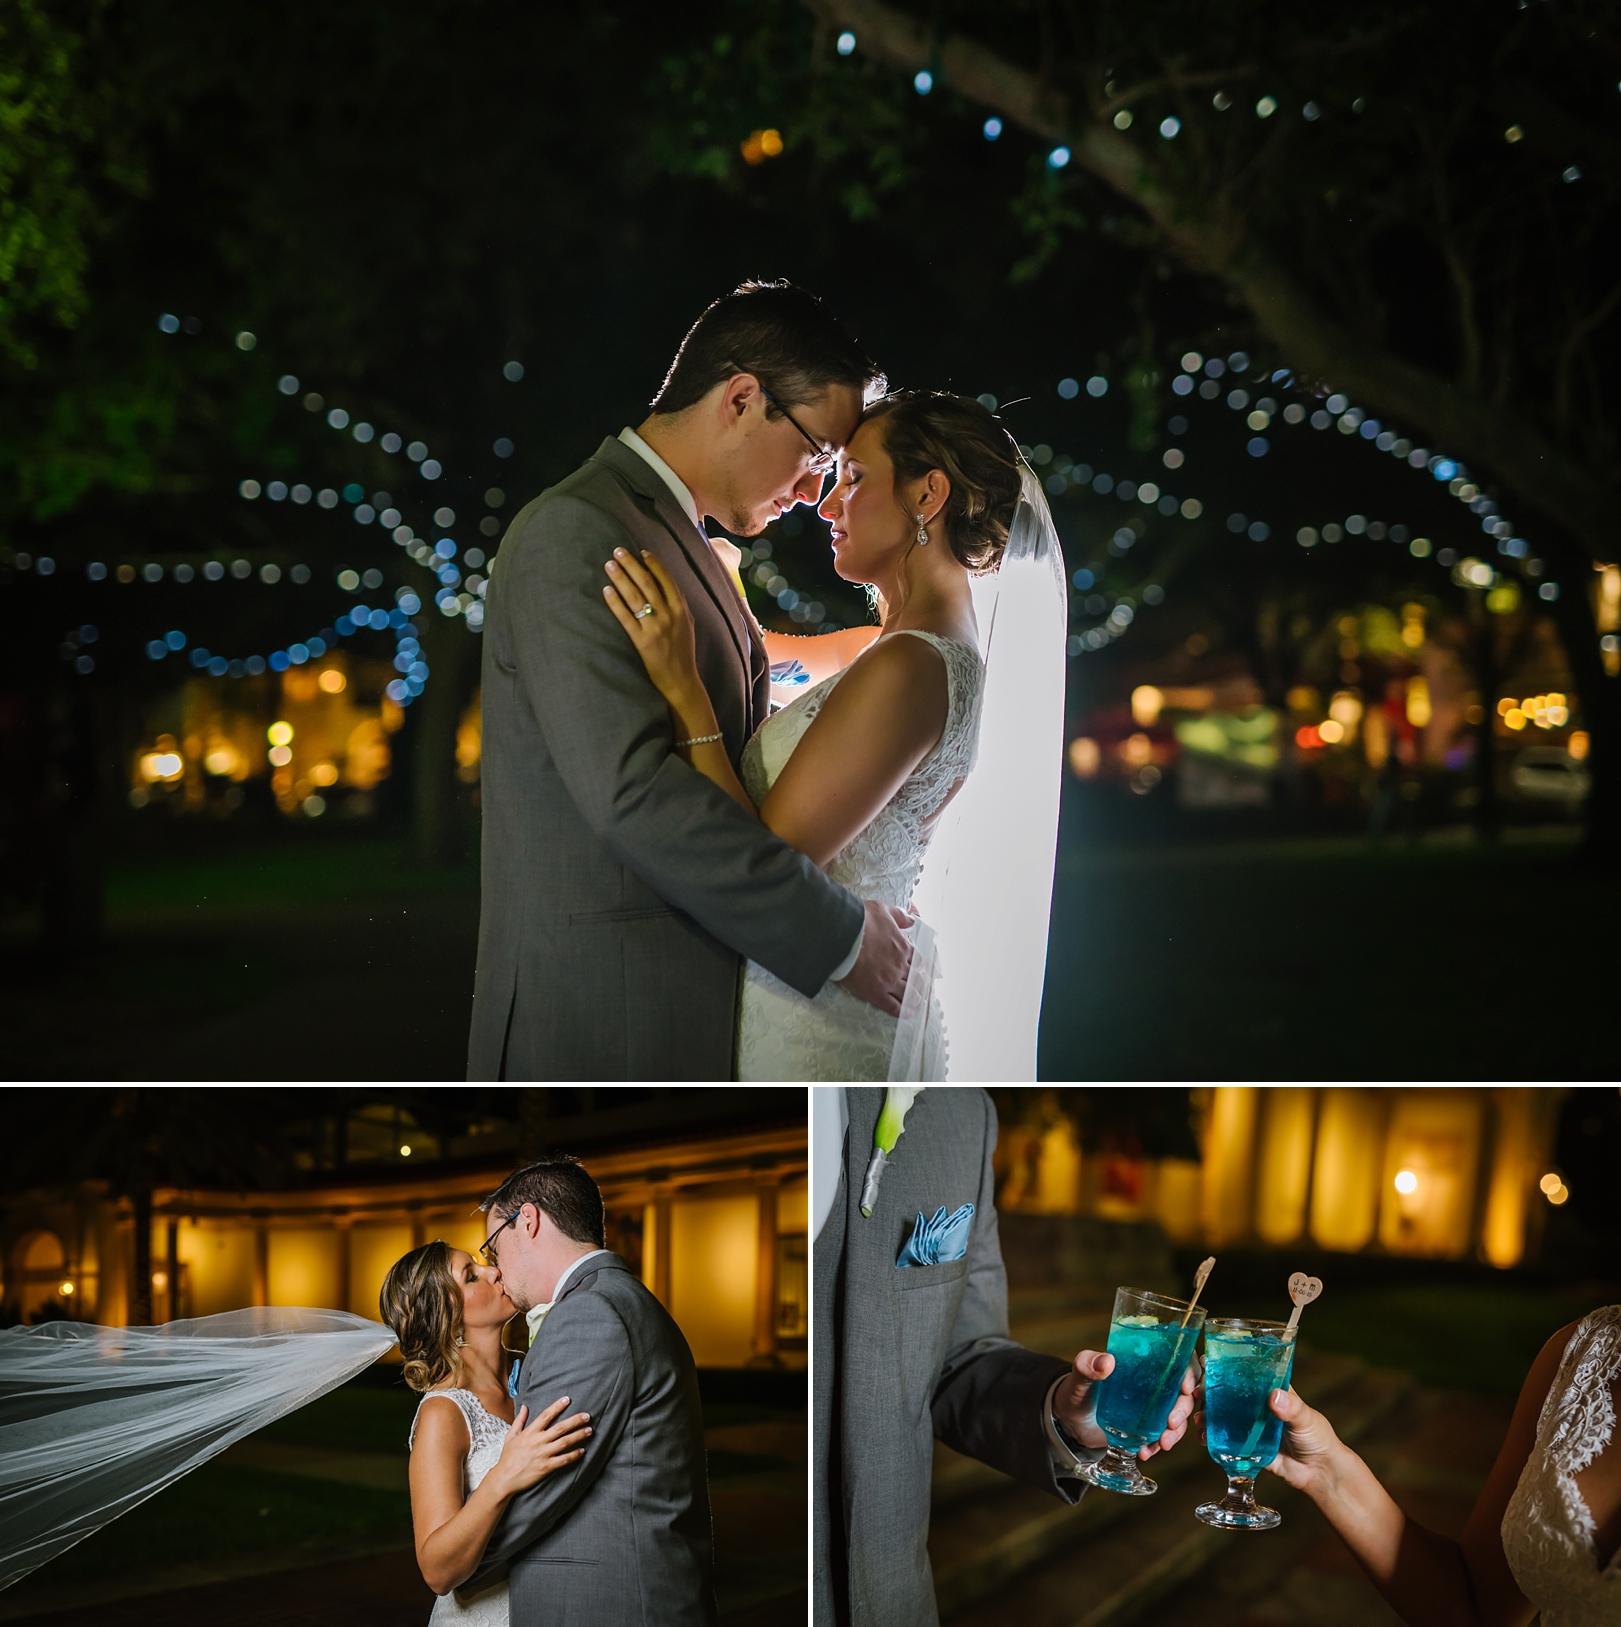 st-pete-art-museum-wedding-vinoy-ashlee-hamon-photography_0017.jpg